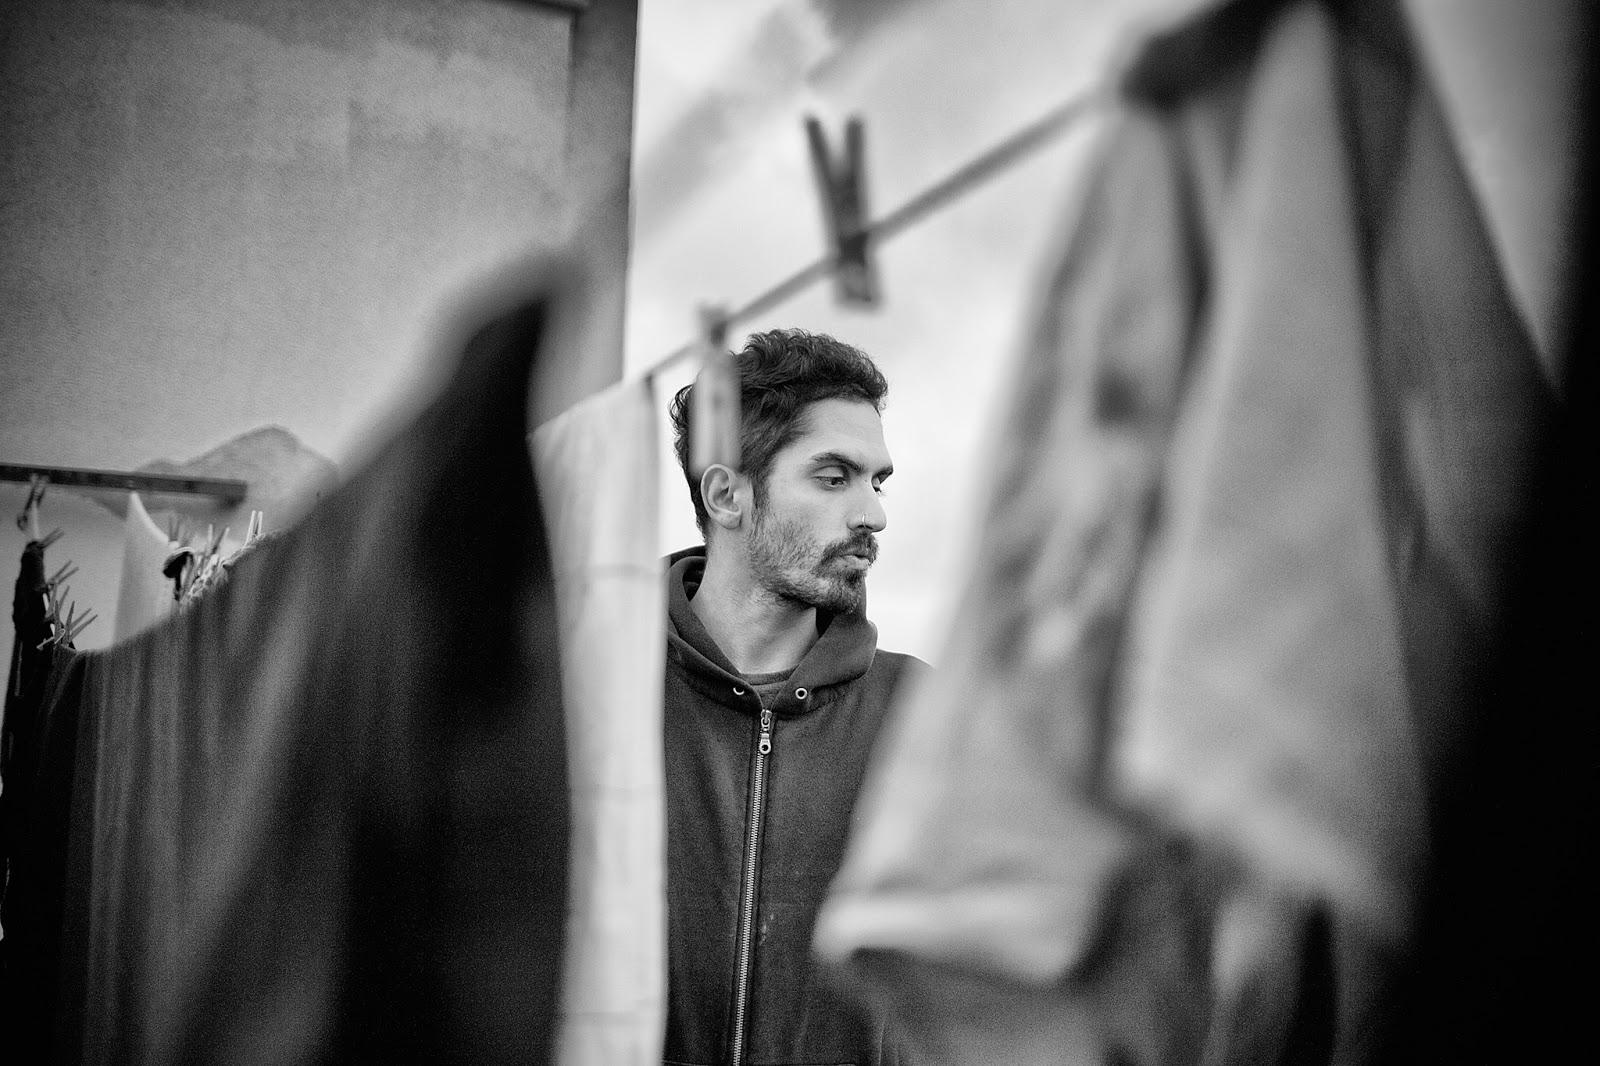 Portrait/Retratos